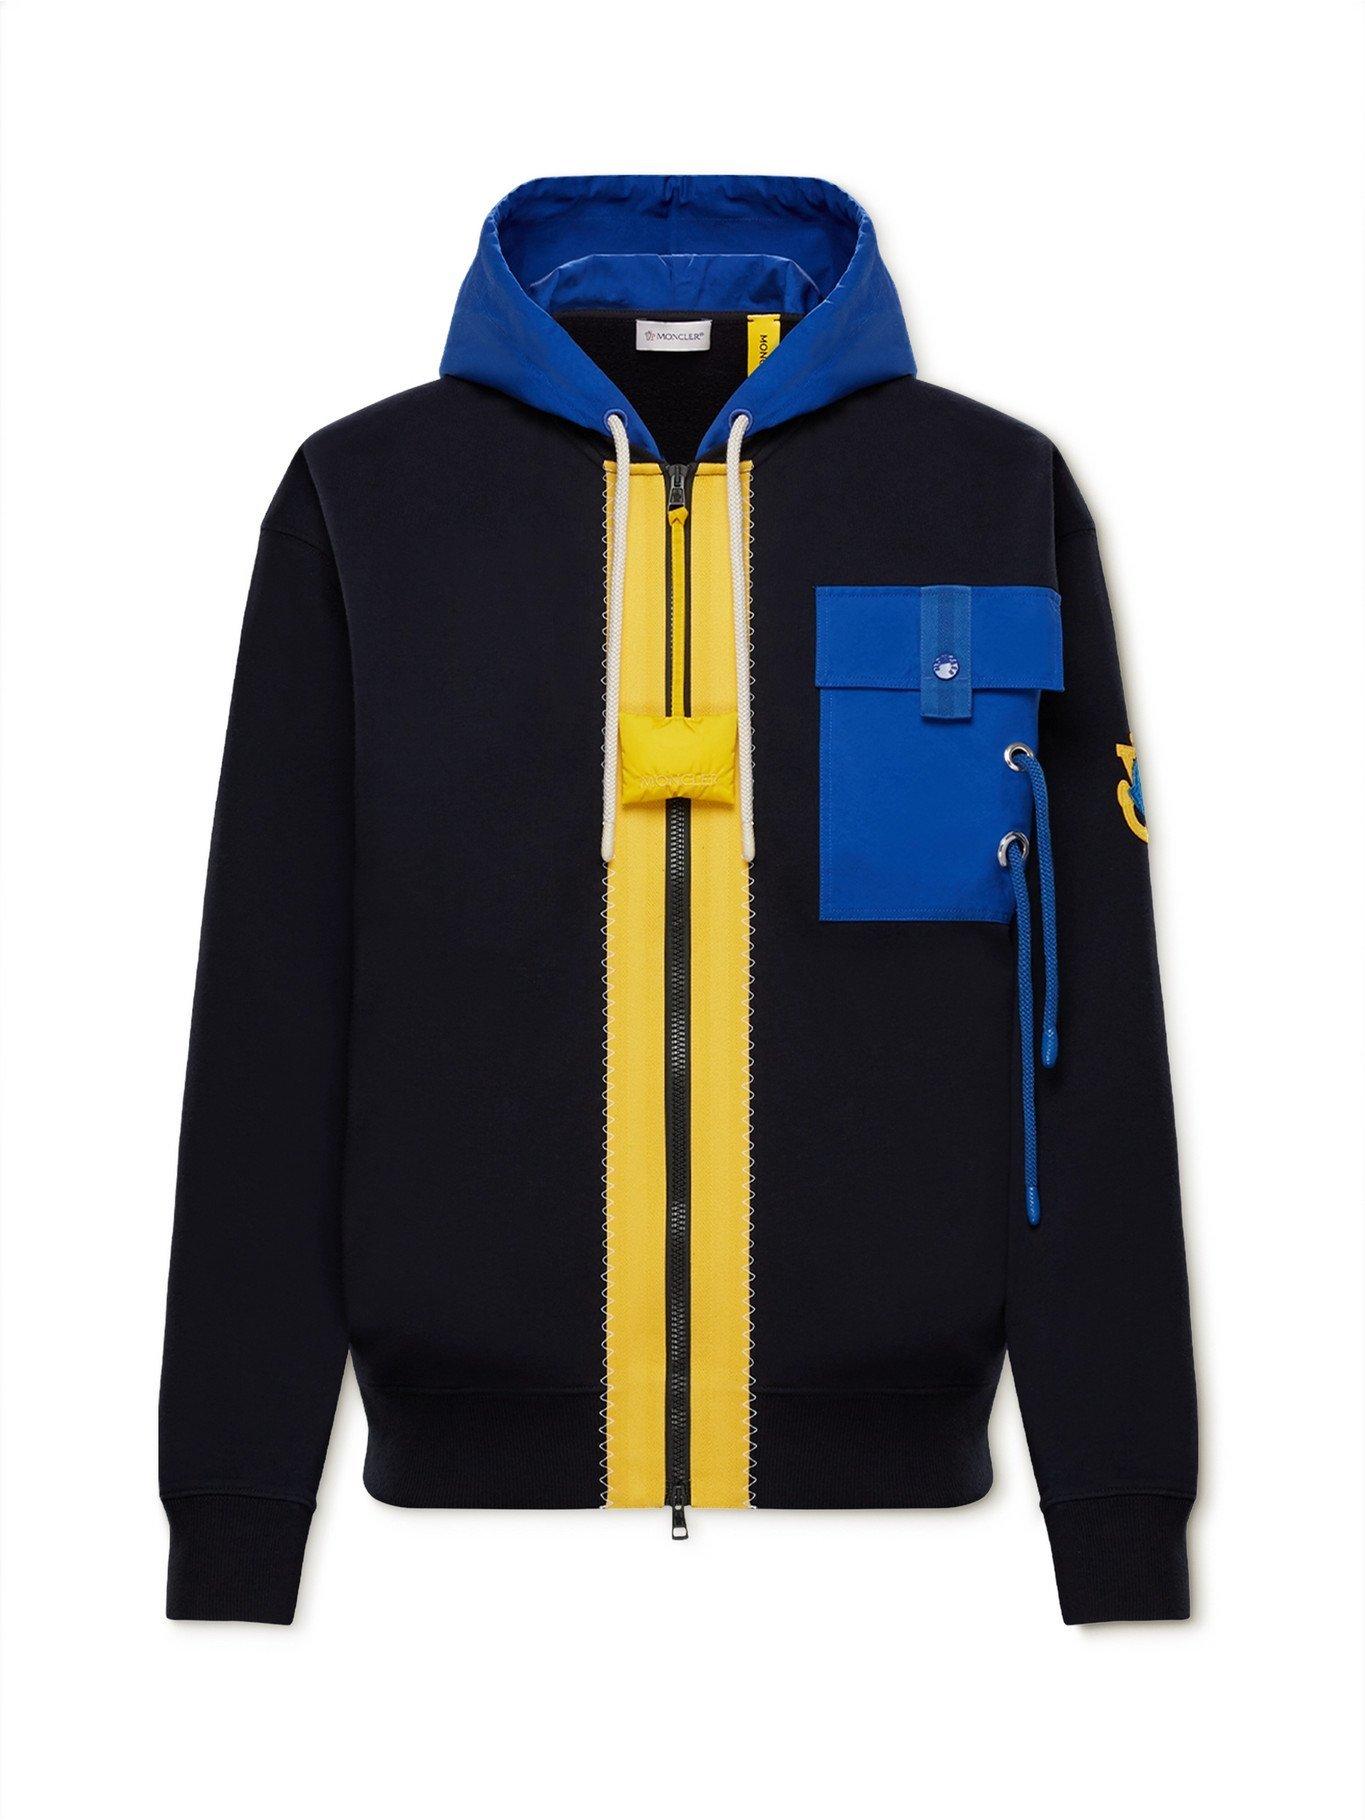 MONCLER GENIUS - 1 Moncler JW Anderson Canvas-Trimmed Cotton-Jersey Zip-Up Hoodie - Blue